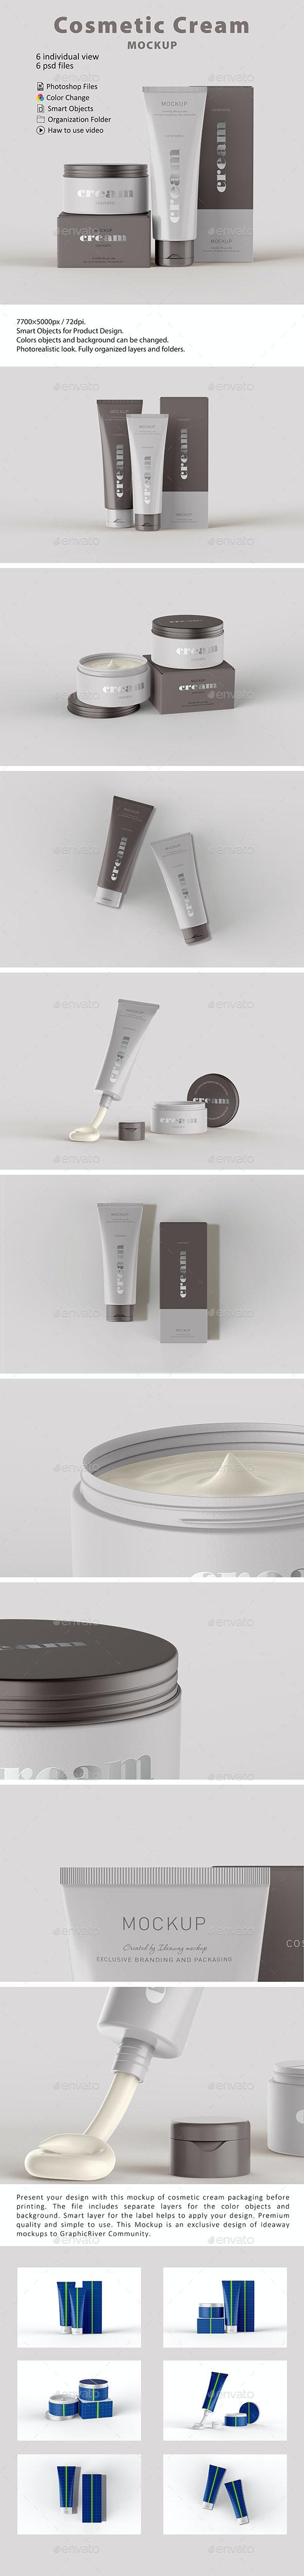 Cosmetic Cream Mockup - Beauty Packaging